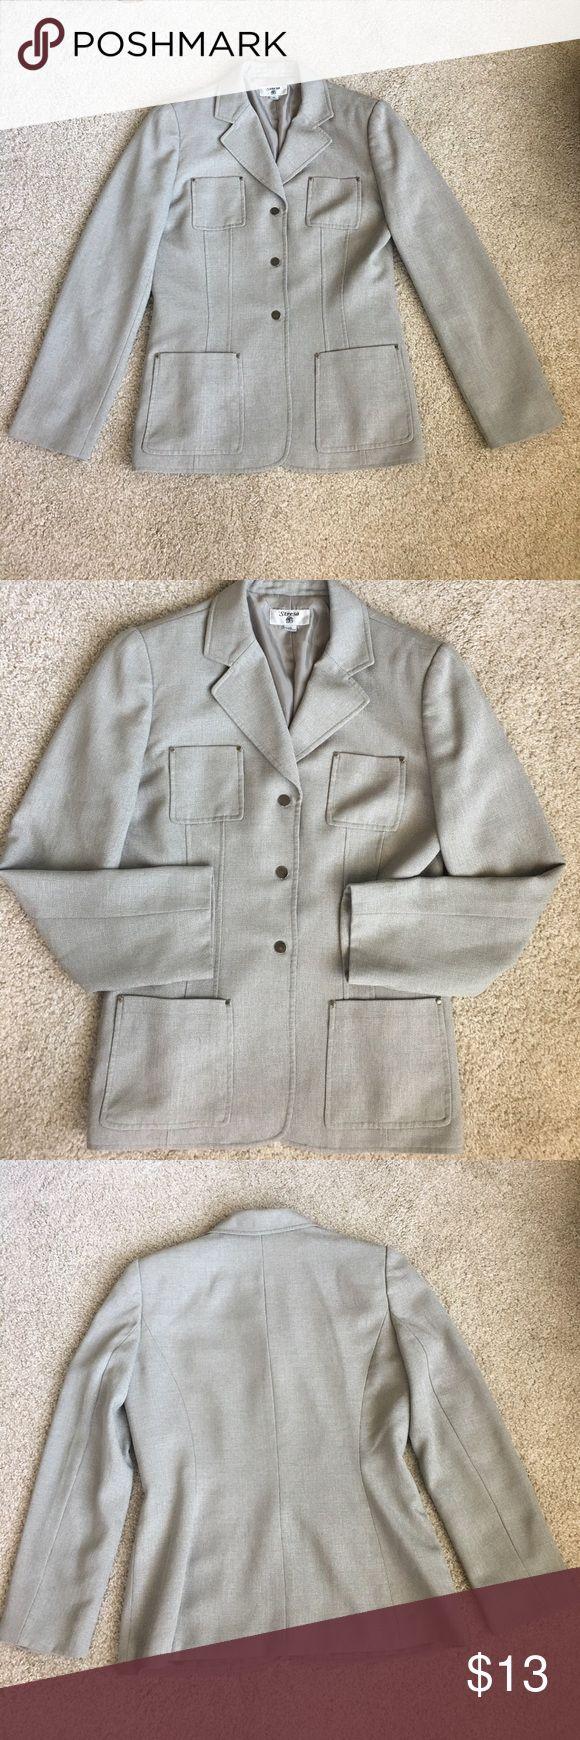 Stresa Olive green Blazer Cute olive green multi pocket studded  Blazer. 💯 polyester. Fully lined. Size 10 women's Stresa Jackets & Coats Blazers